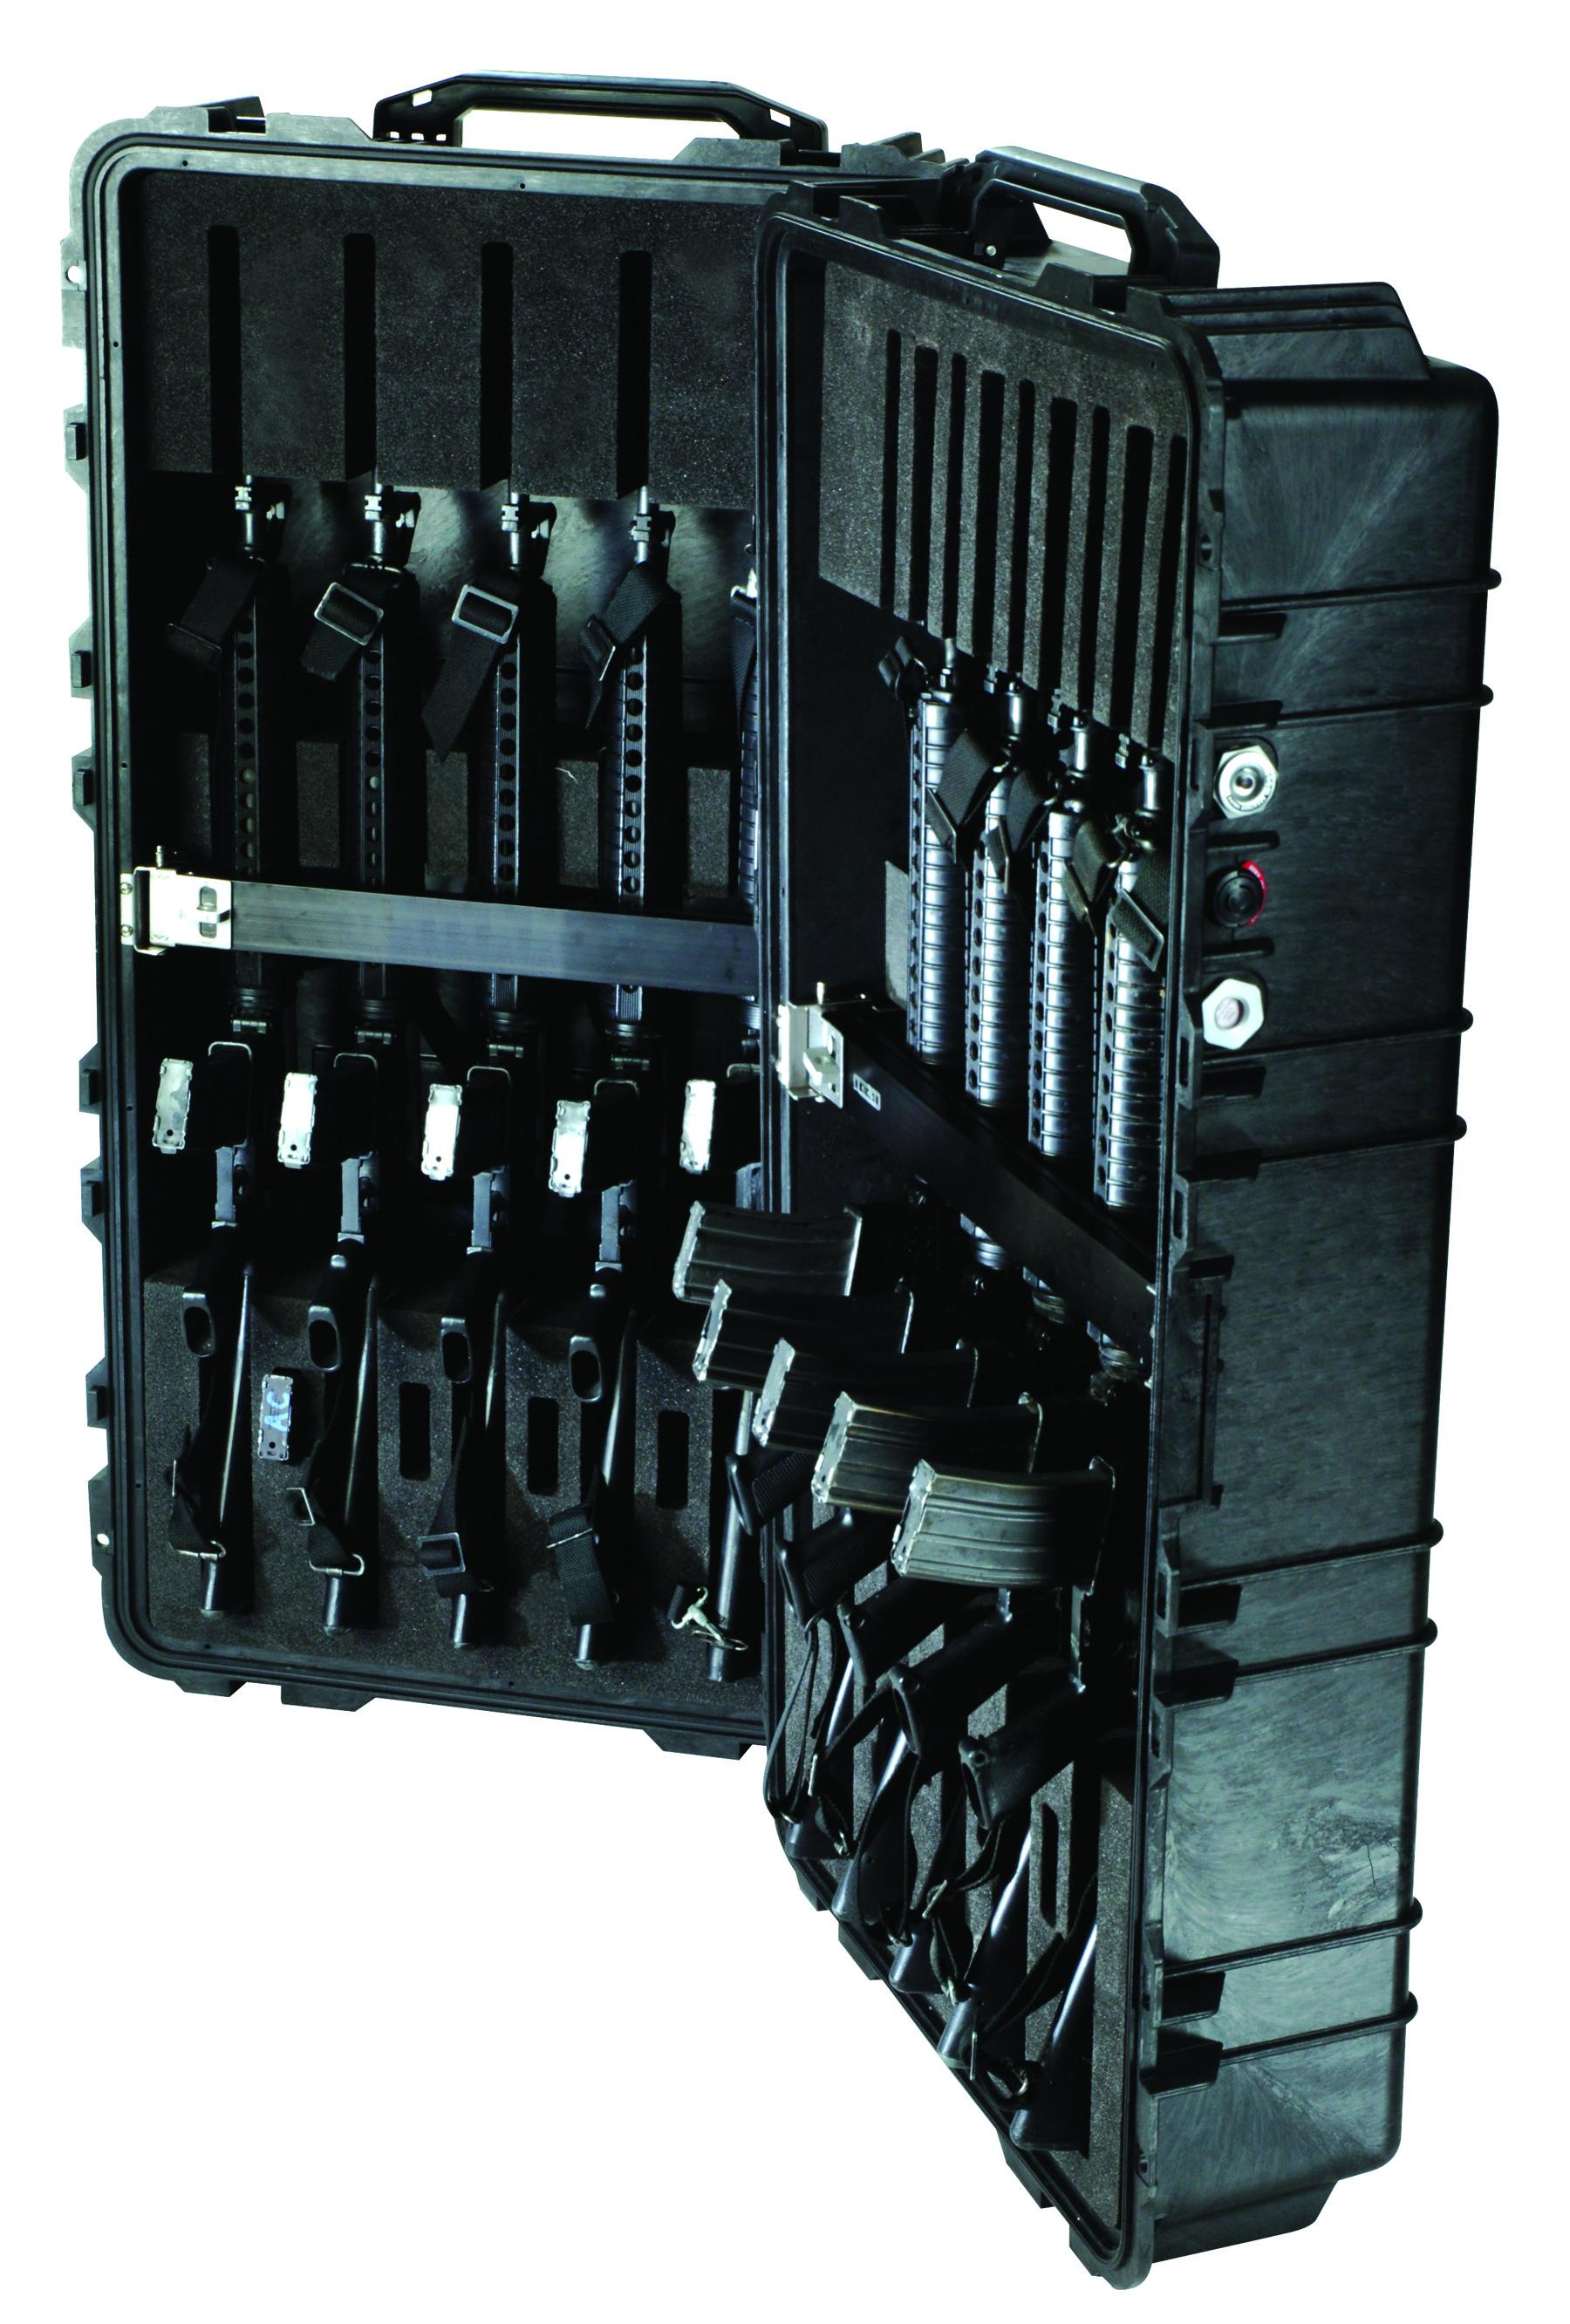 1780H - Pelican 1780HL Weapons Case Rifles liner insert